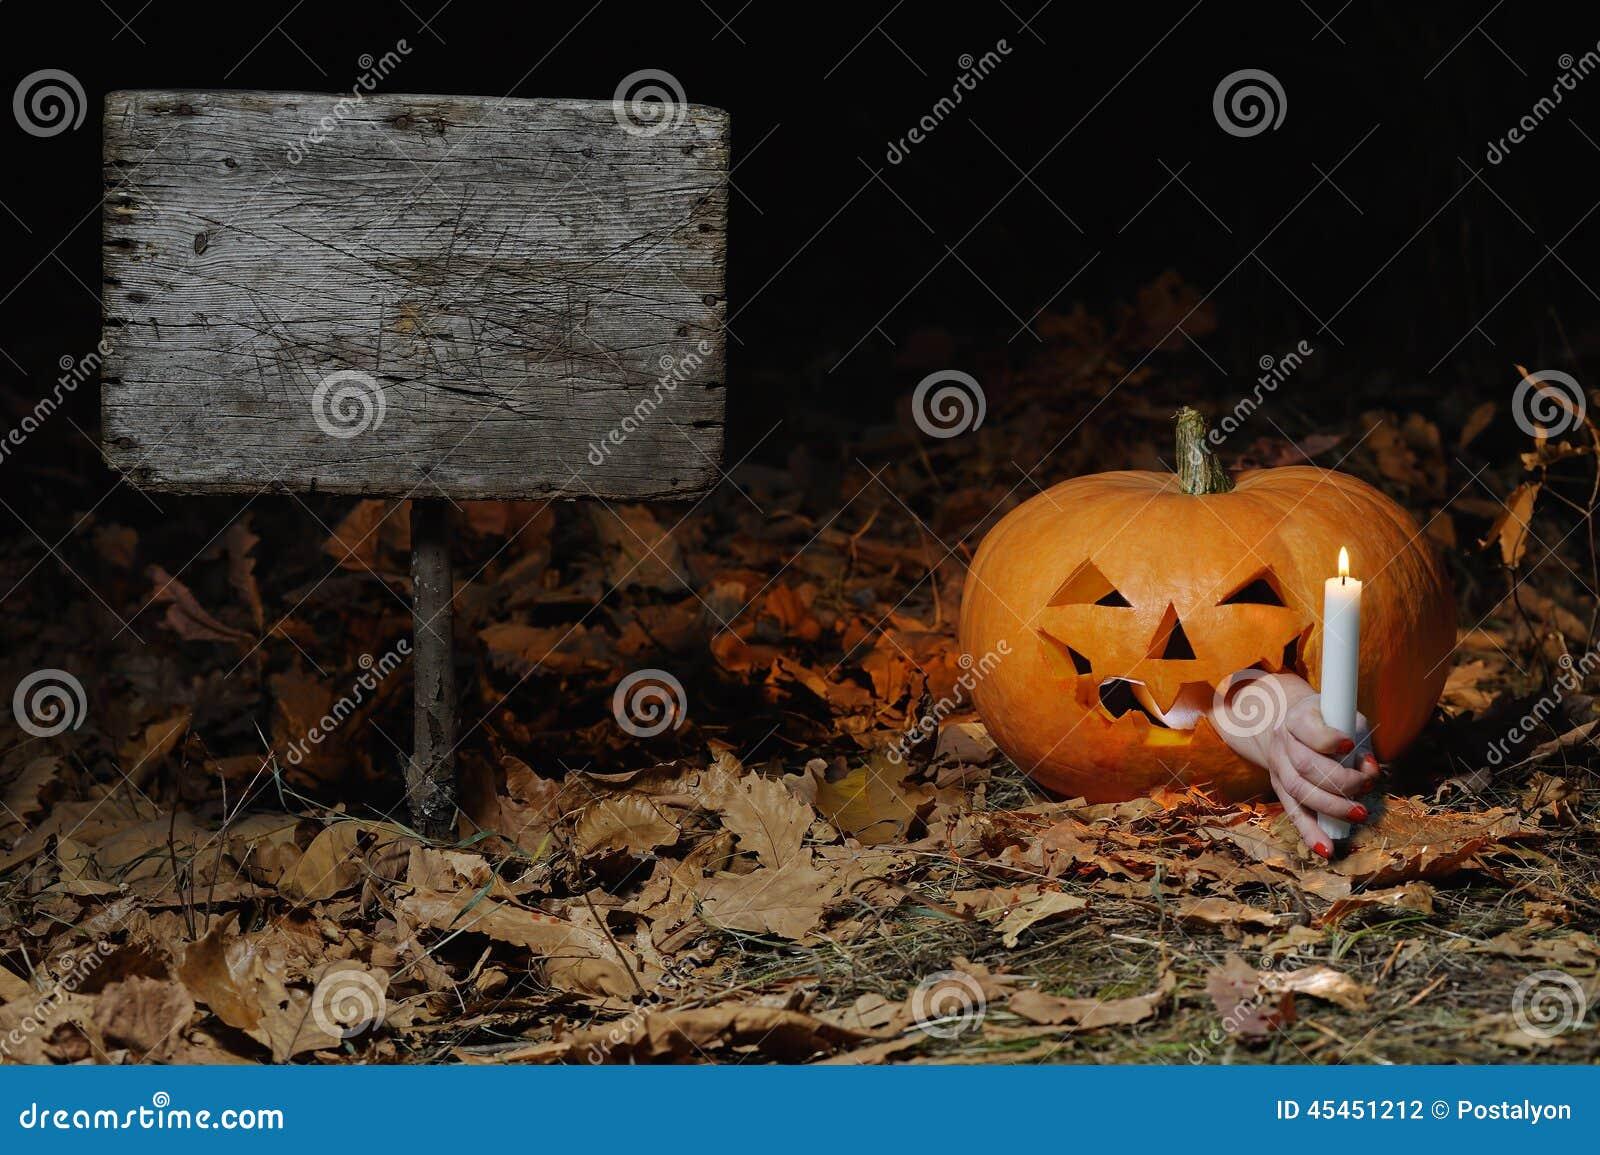 Funny Halloween.